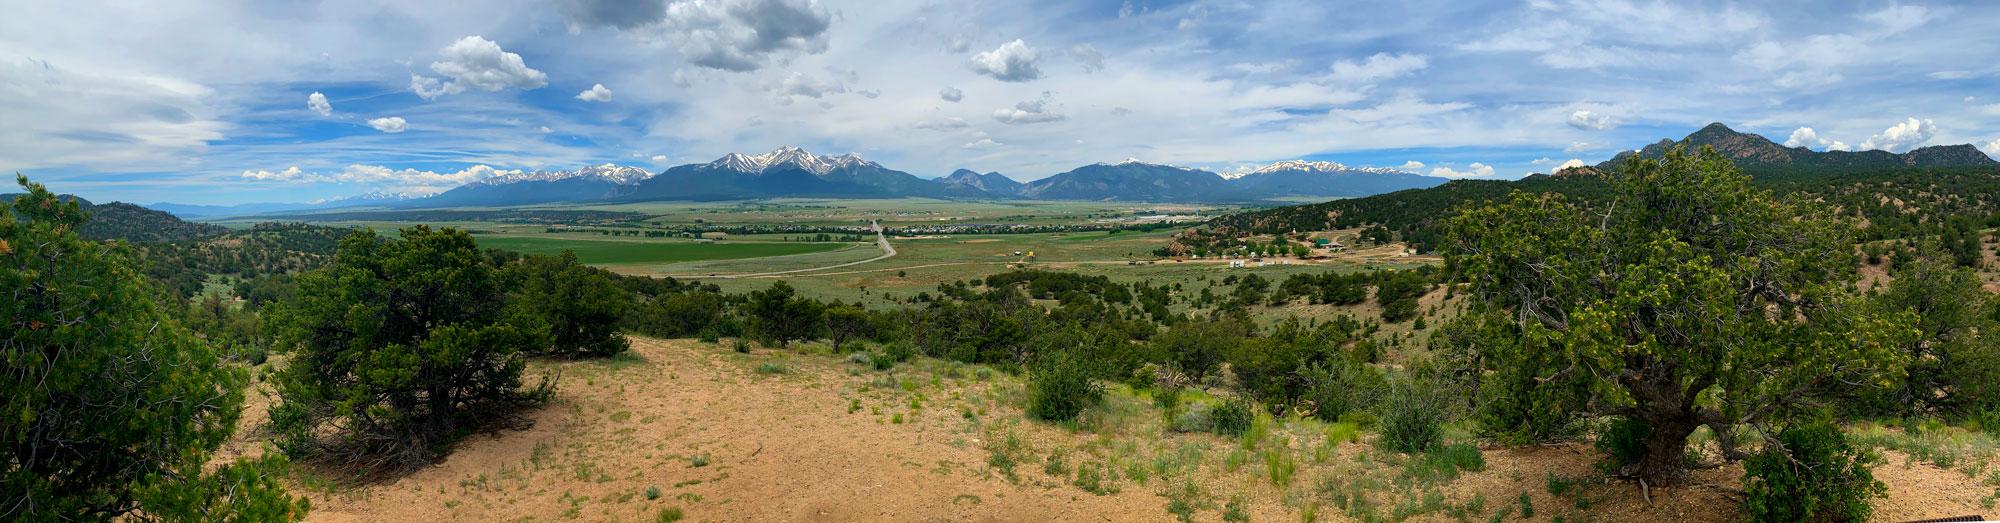 Ben's Panorama, great shot